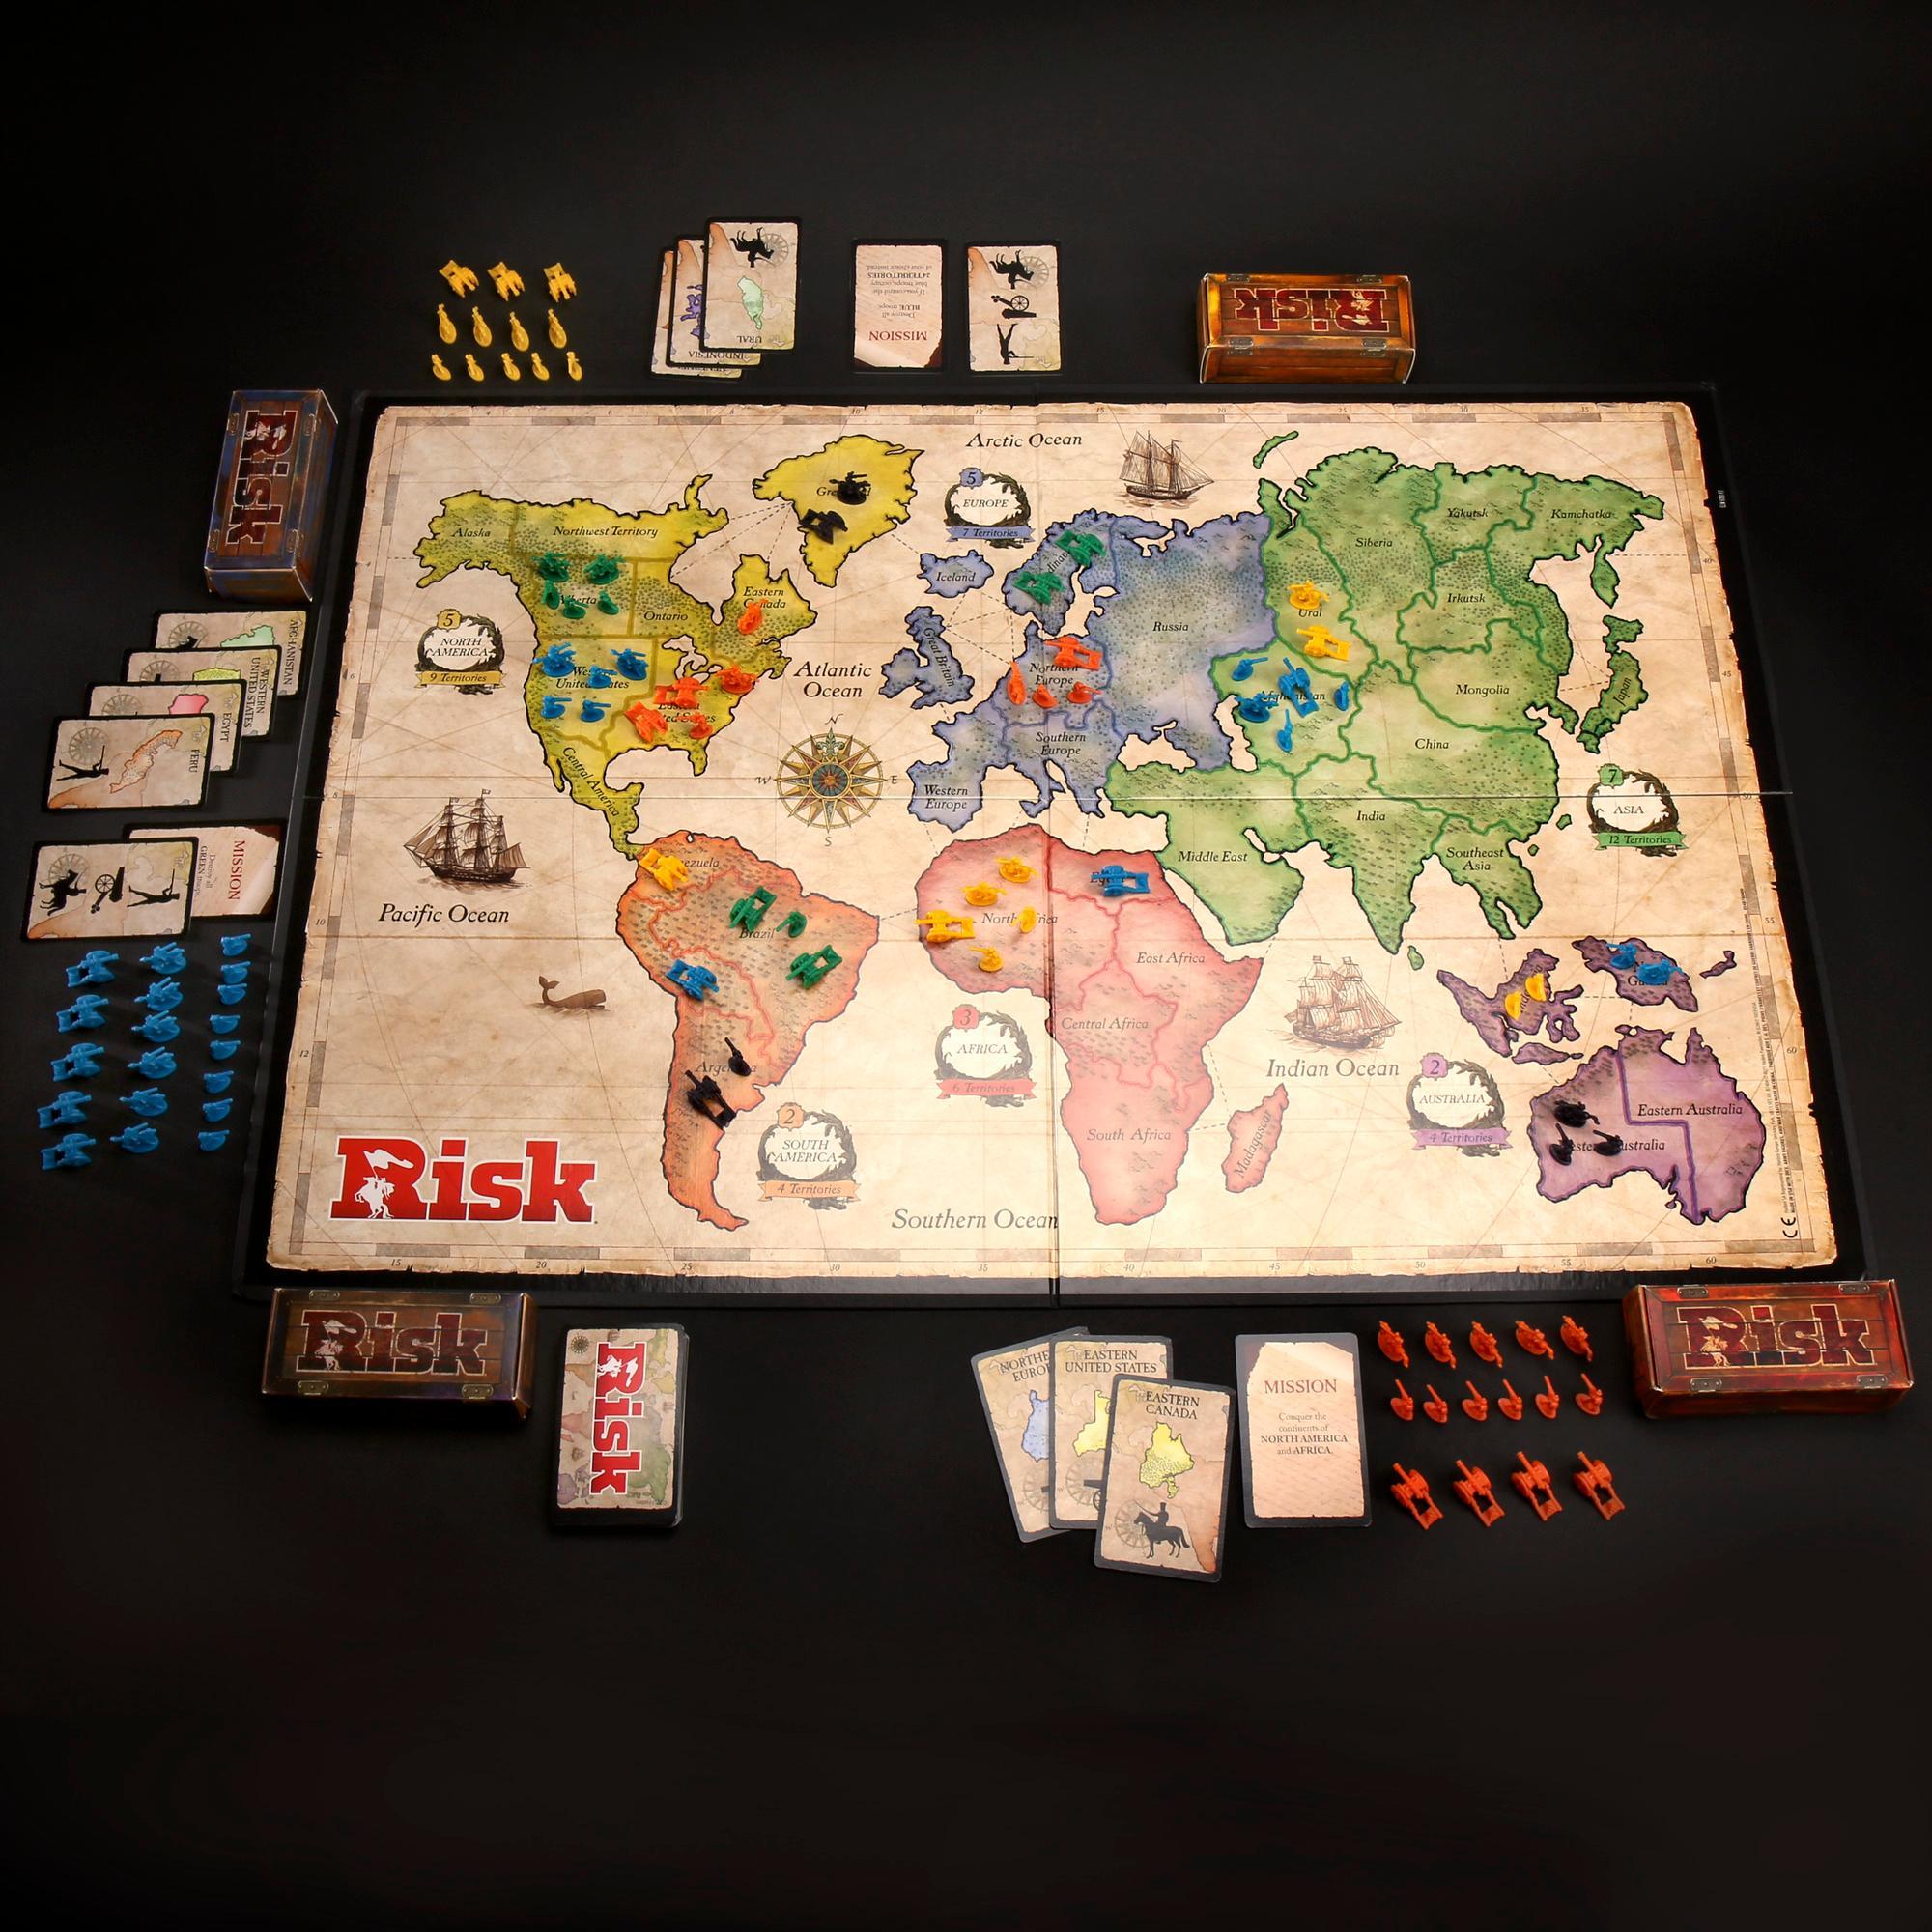 Spiele Risiko